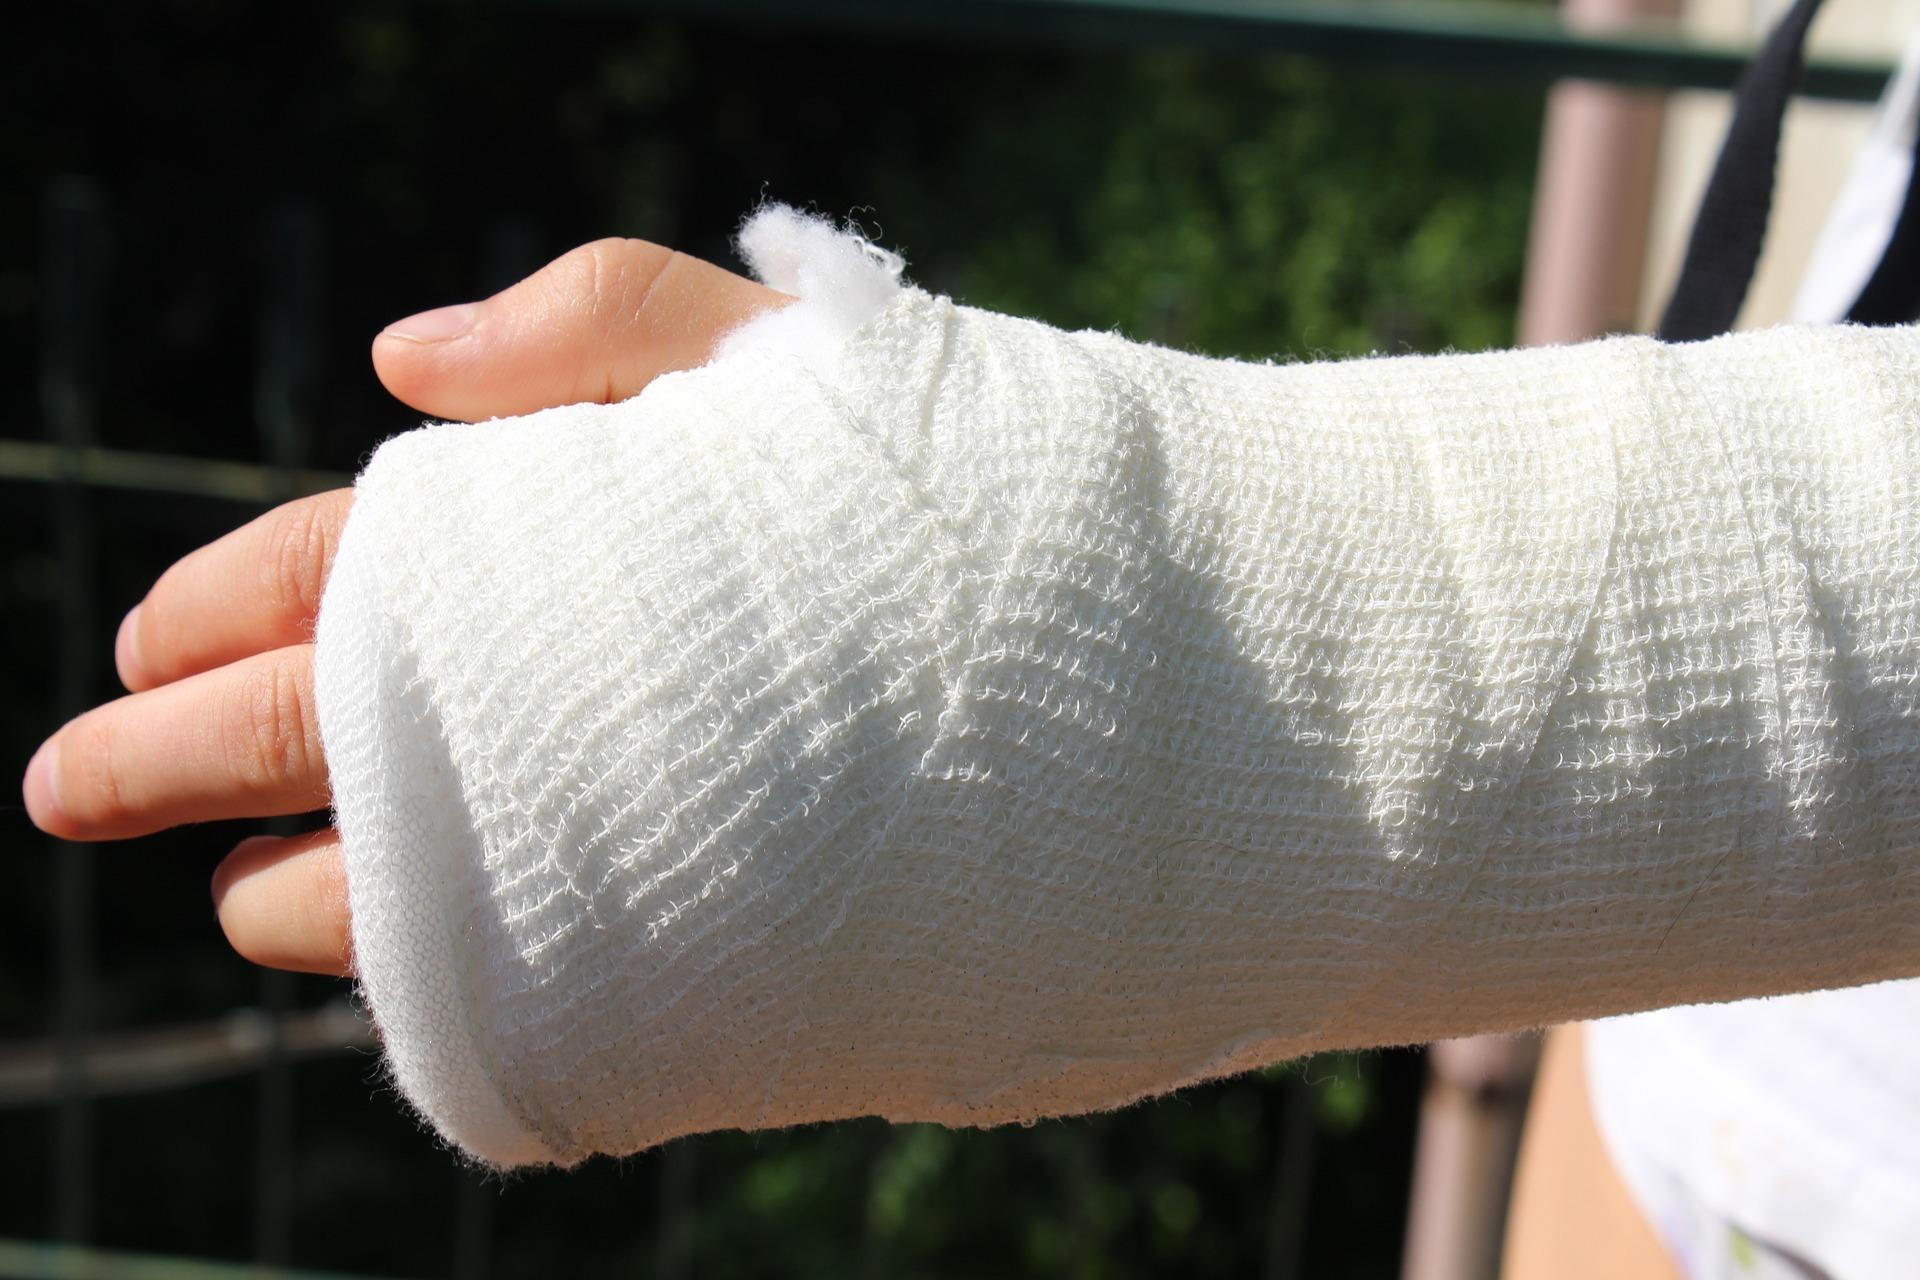 injury-3532338_1920_original.jpg